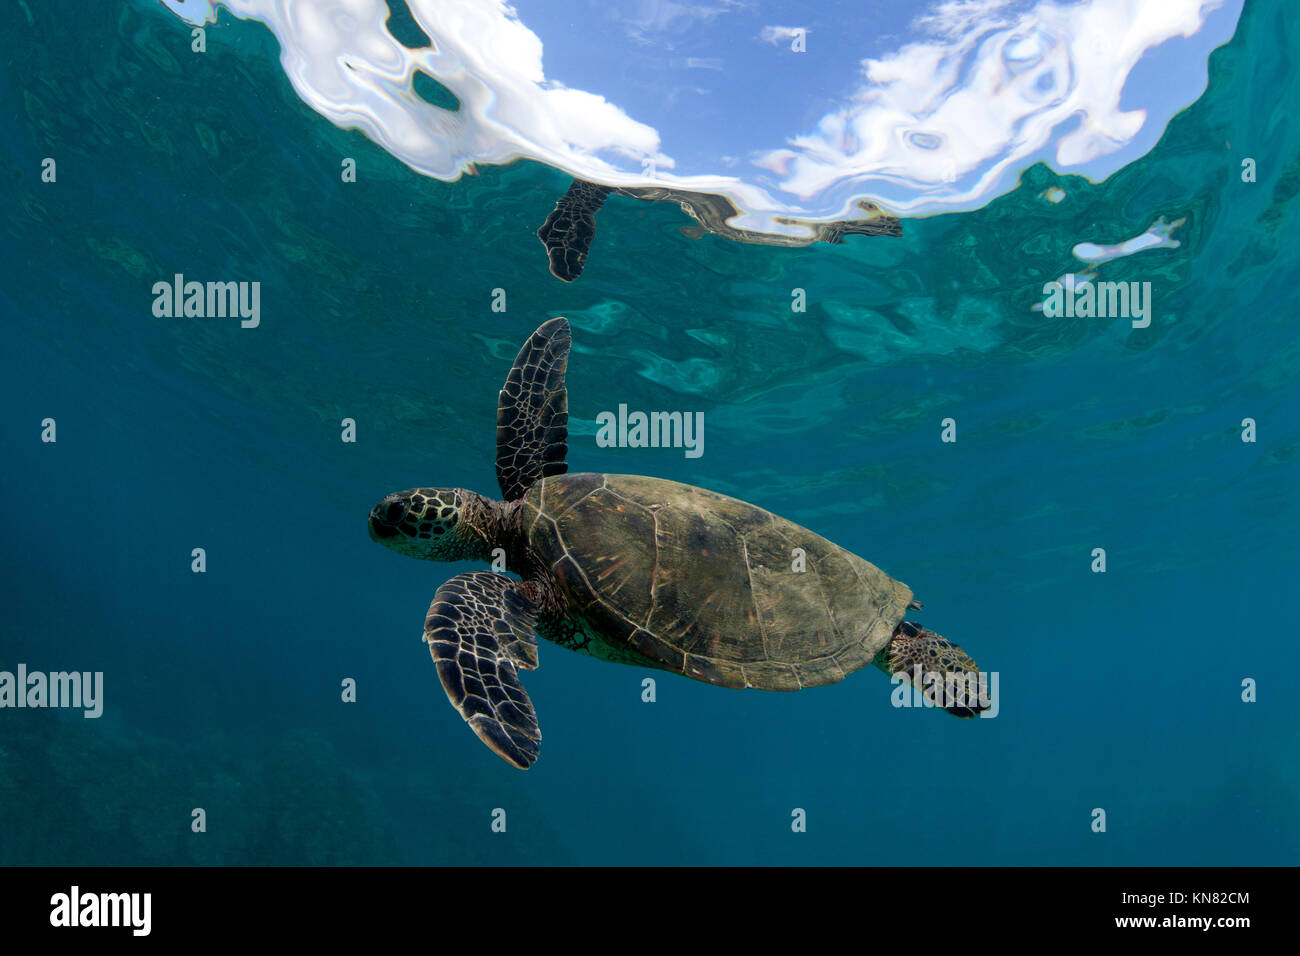 Green sea turtle at Black Rock, Kaanapali, Maui, Hawaii. - Stock Image